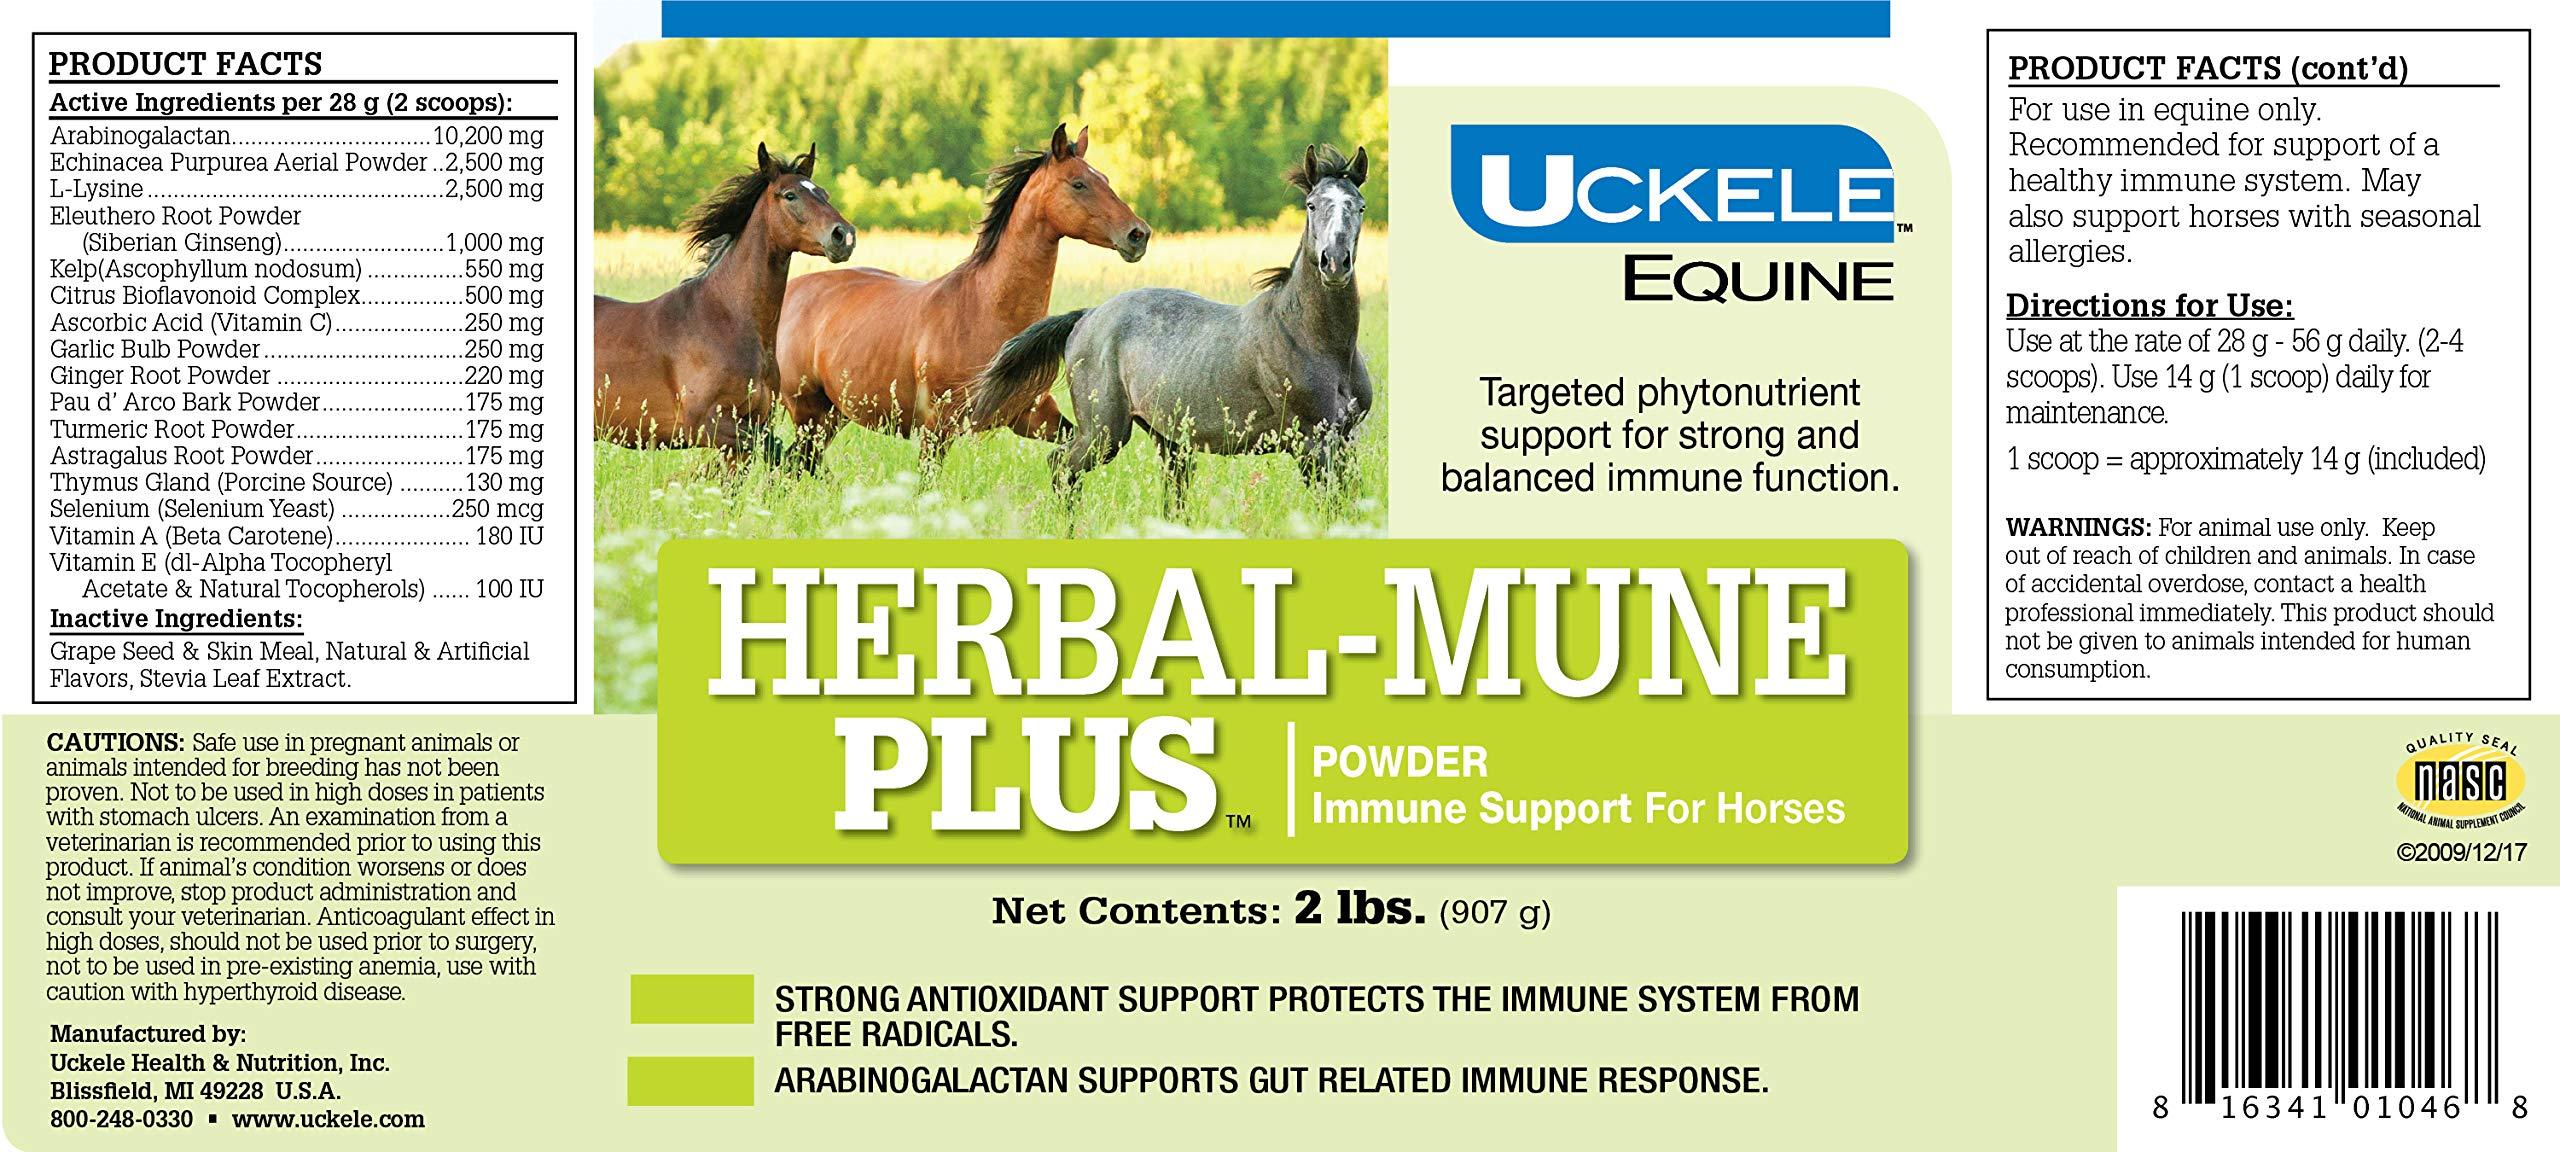 Uckele Herbal-Mune Plus Horse Supplement, 2-Pound by Uckele